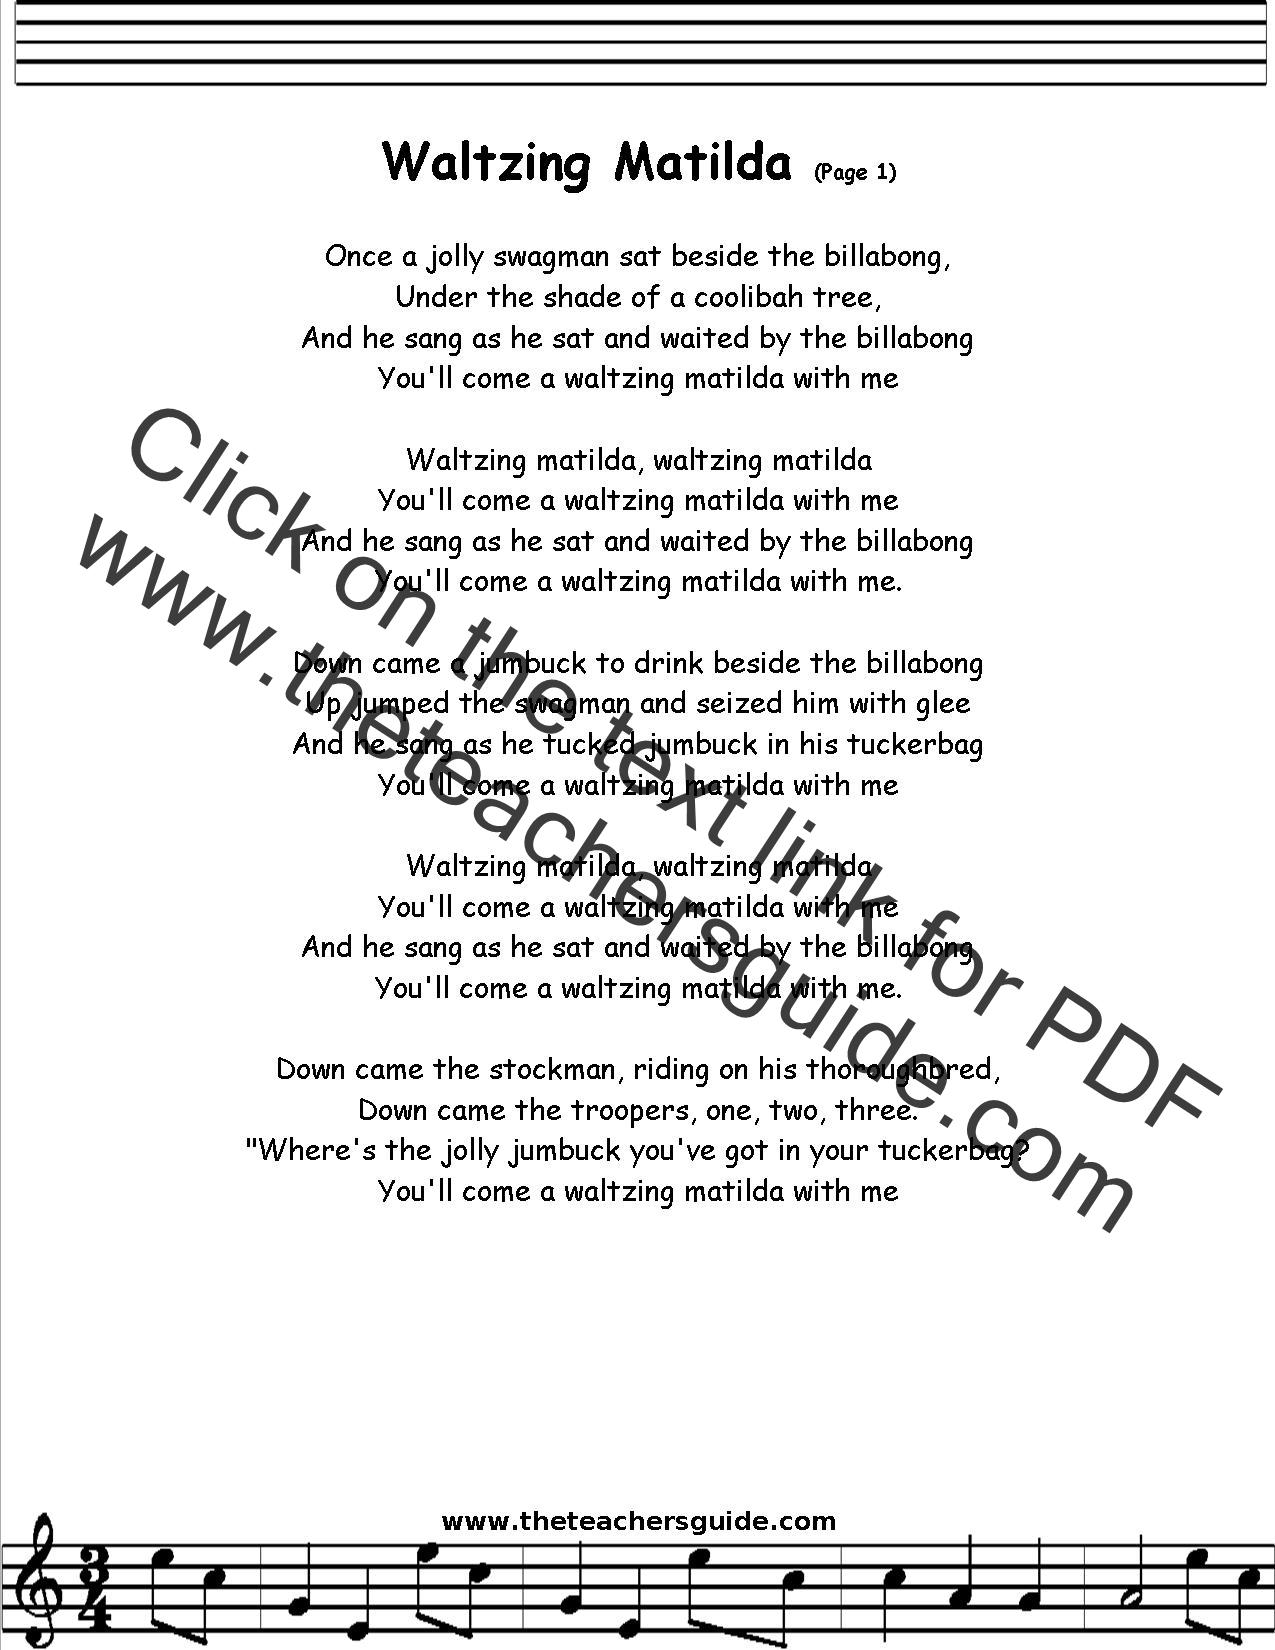 Waltzing Matilda Lyrics Printout Midi And Video